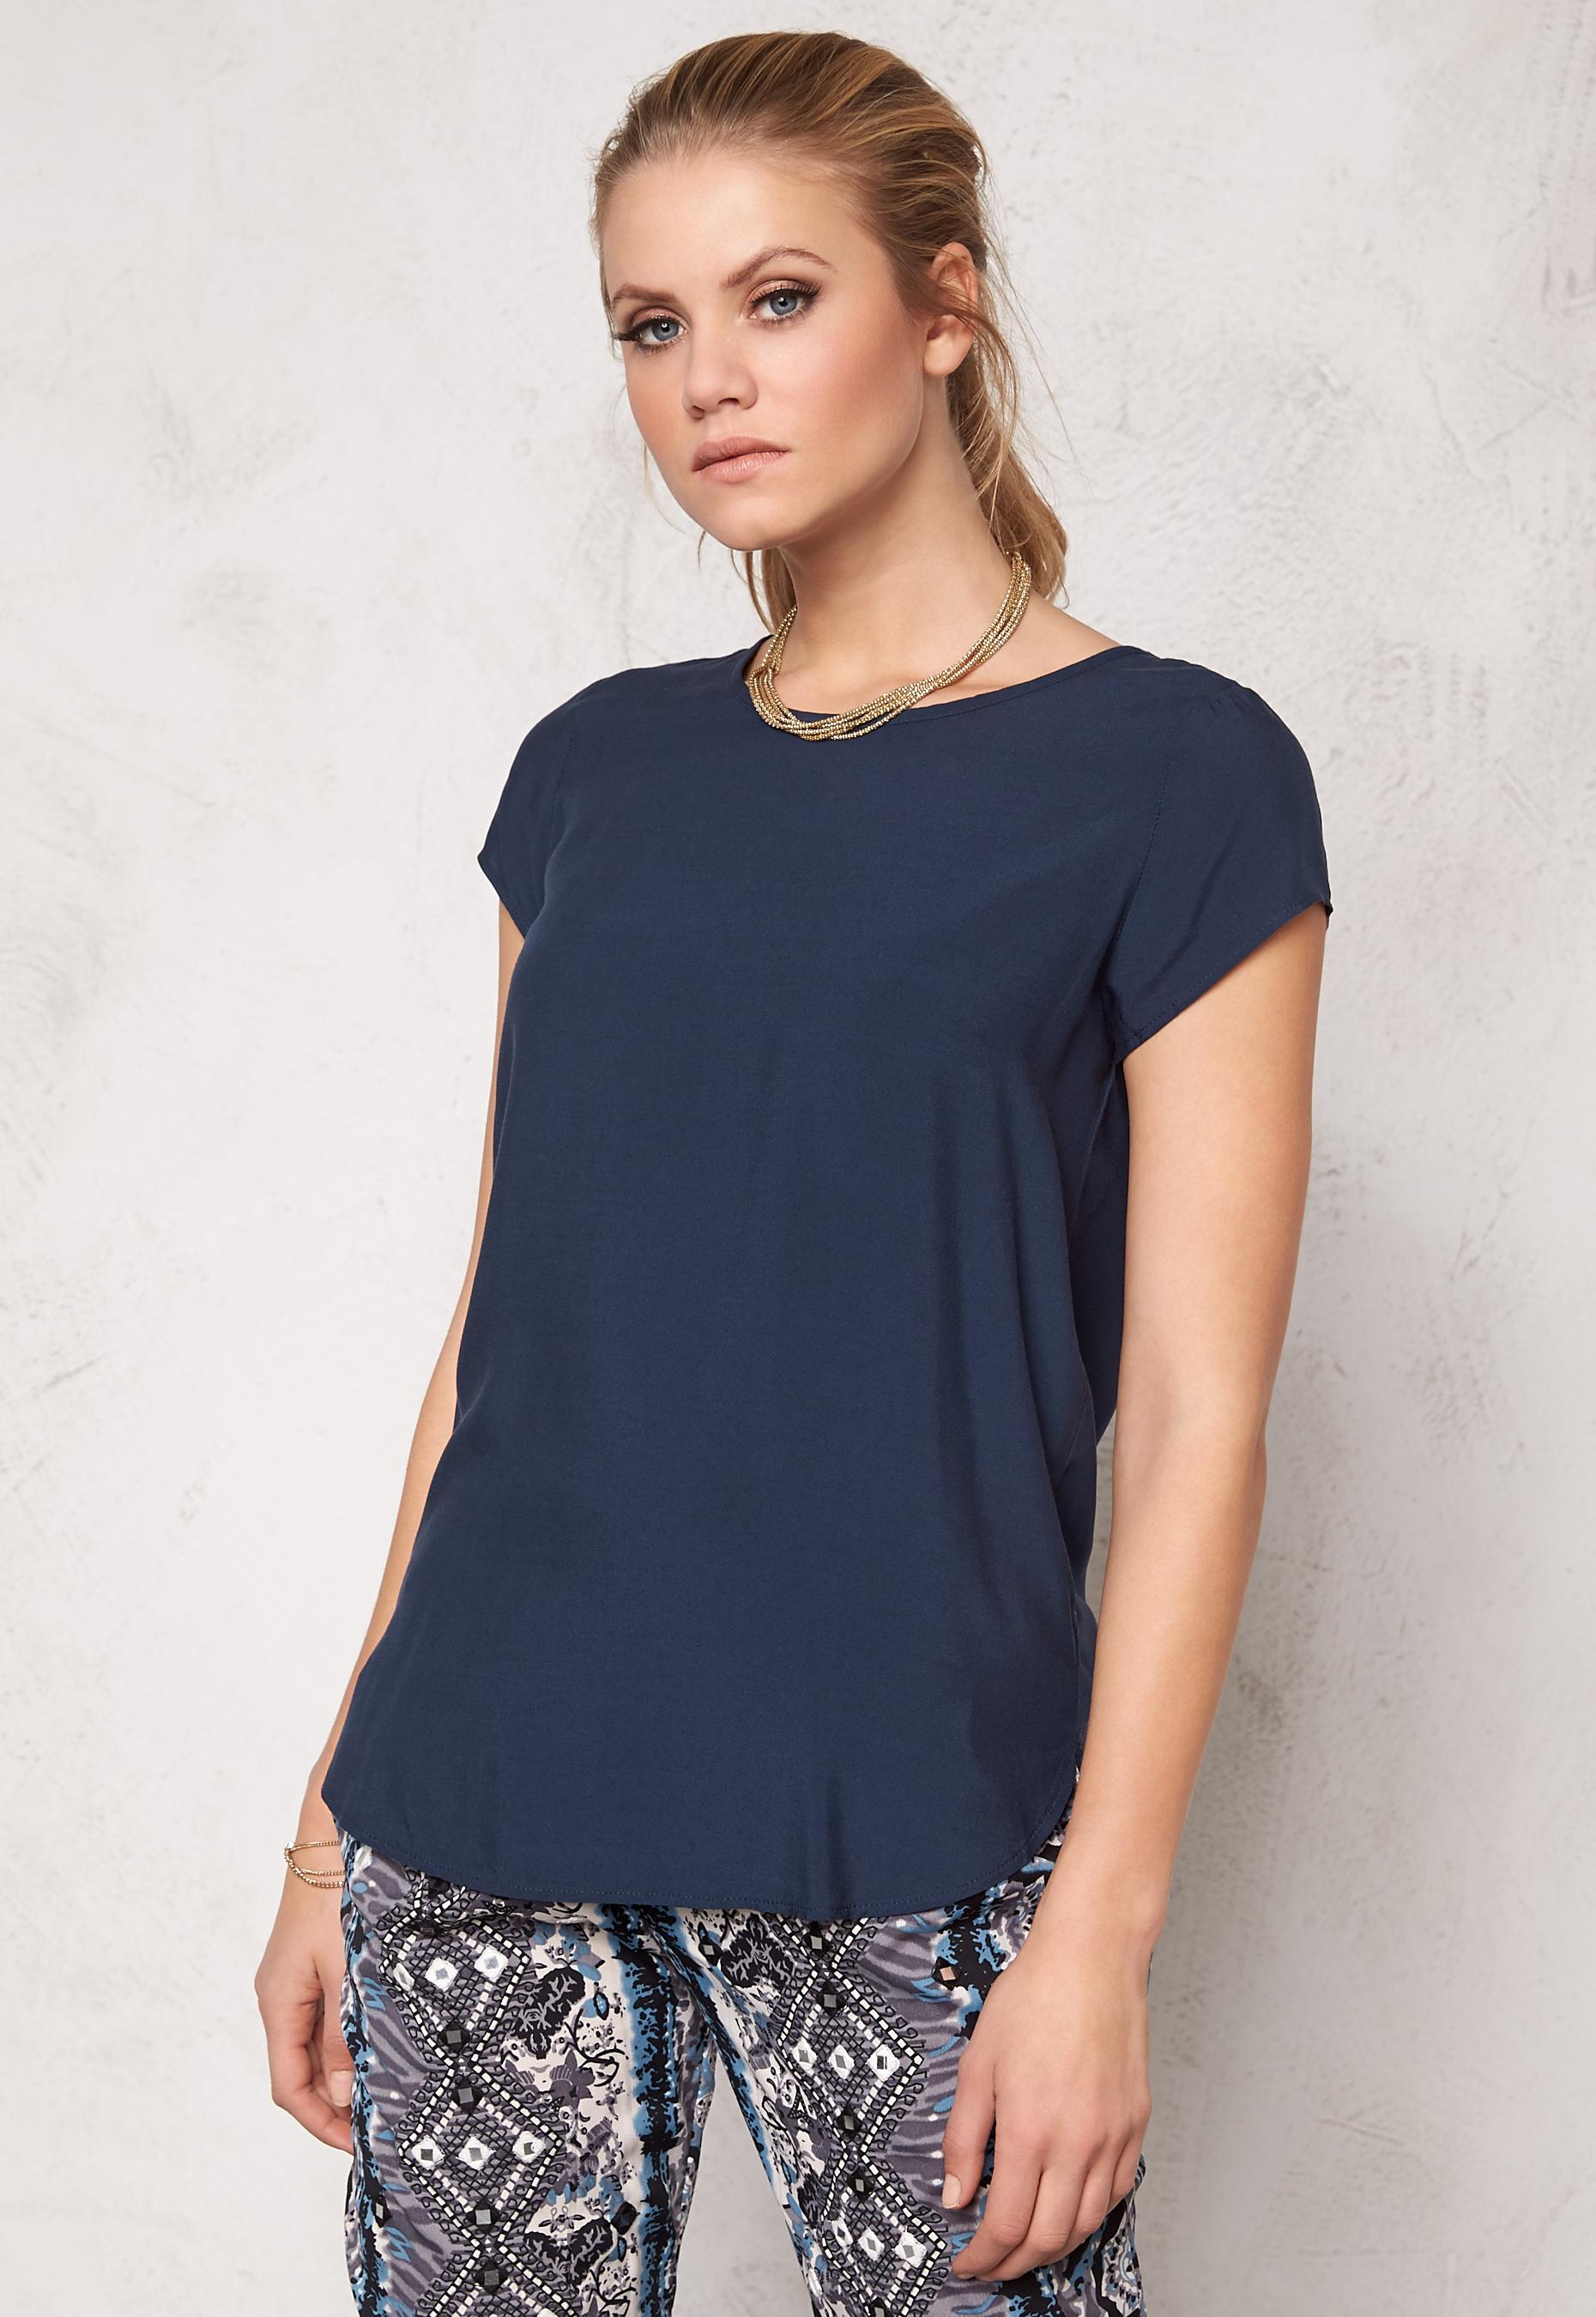 Waisted Jersey Dress - Black iris Vero Moda Outlet Discount Authentic rDb7dW5YJX